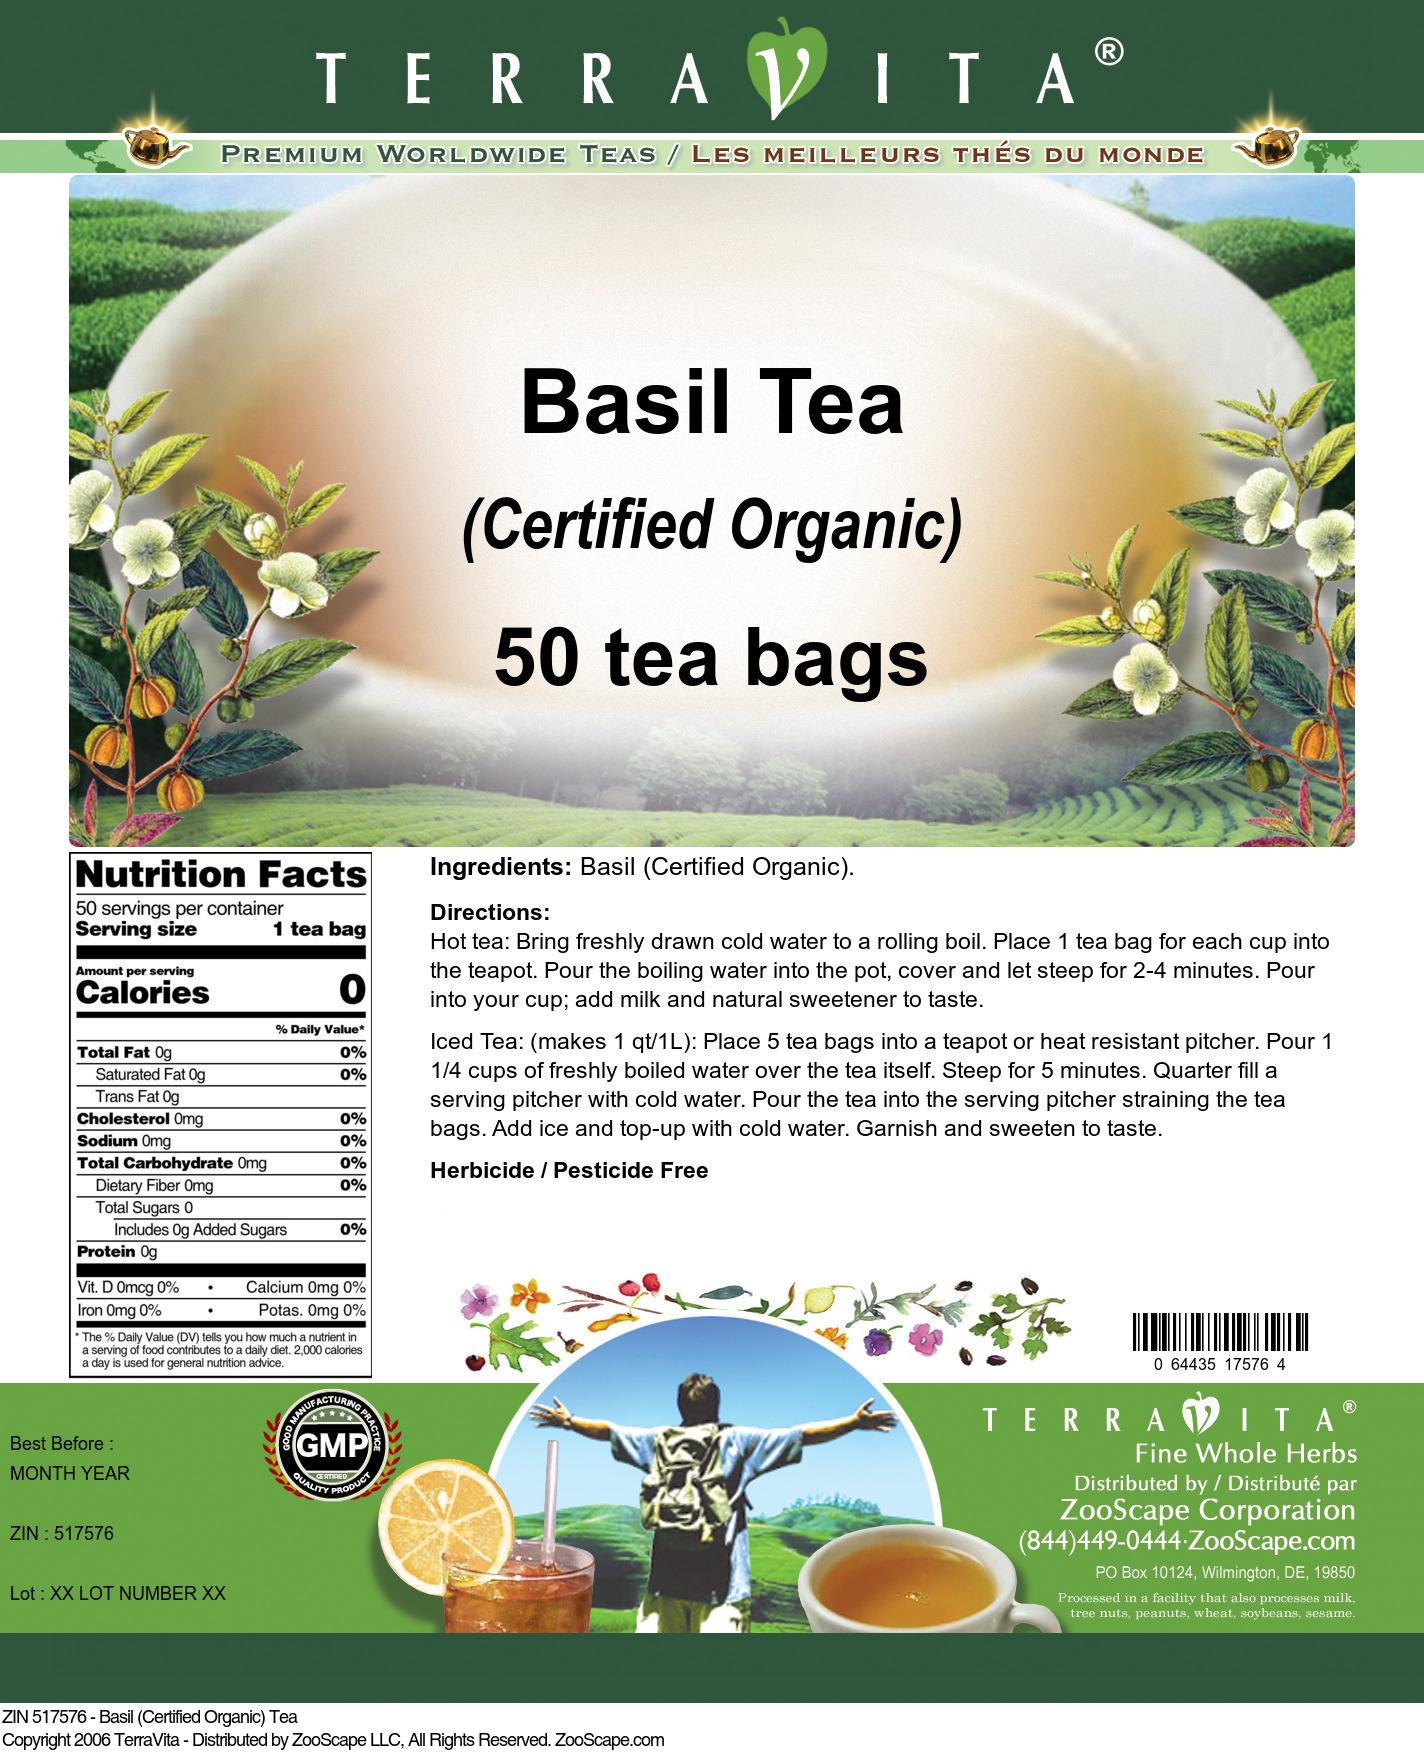 Basil (Certified Organic) Tea